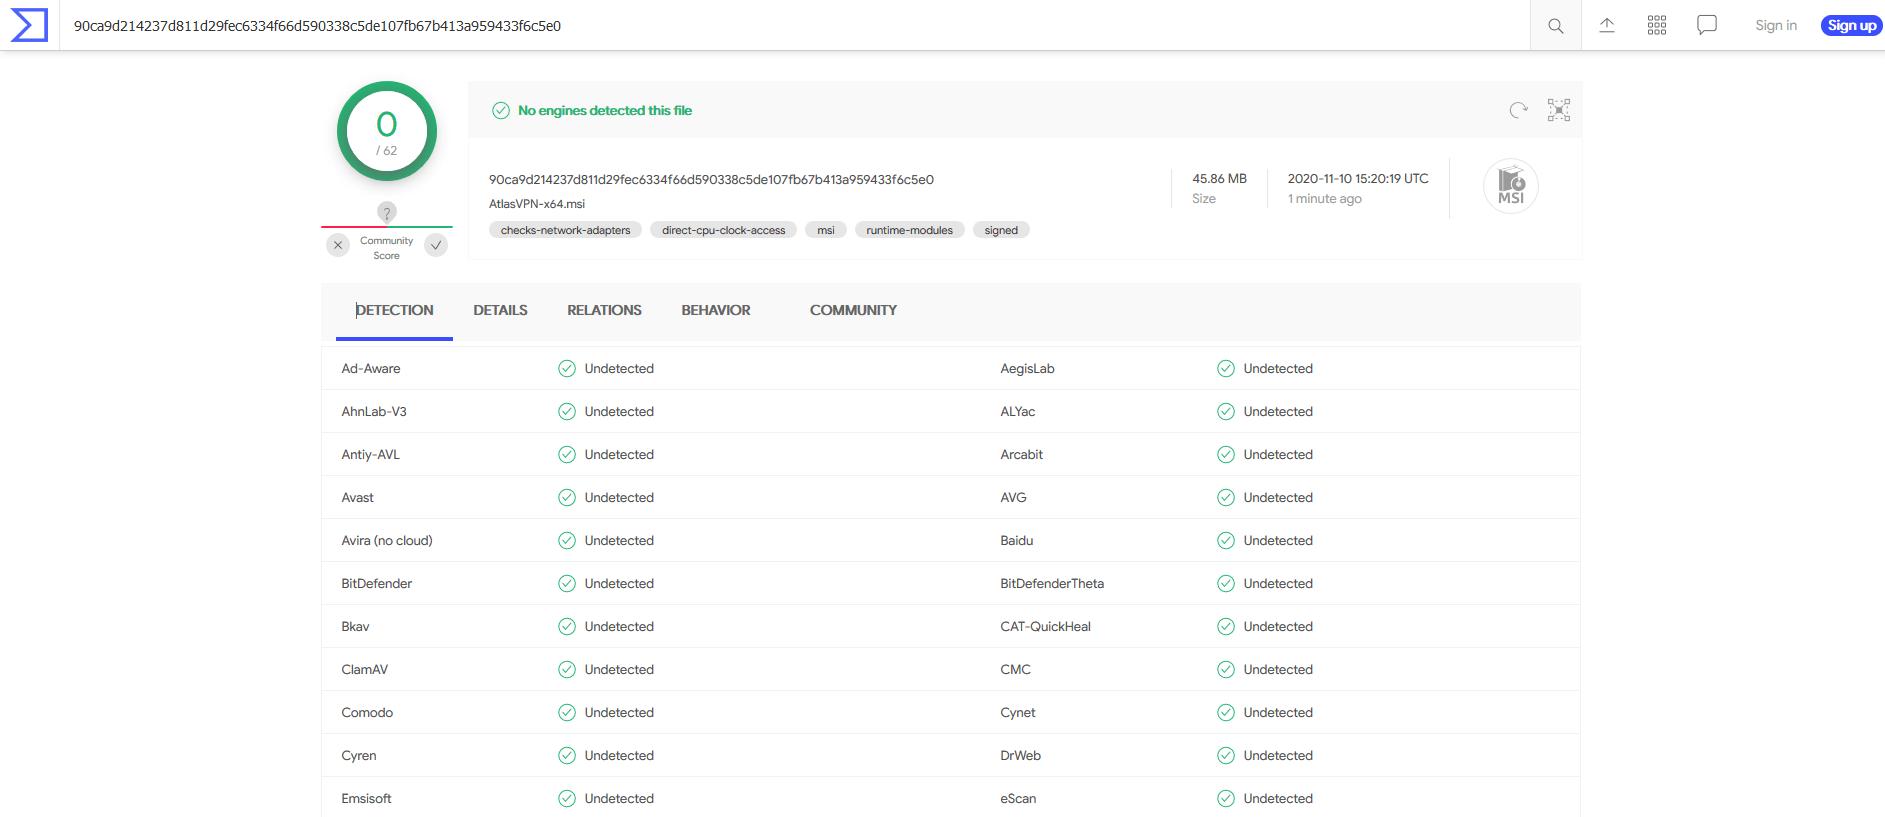 Atlas VPN Total Virus Scan